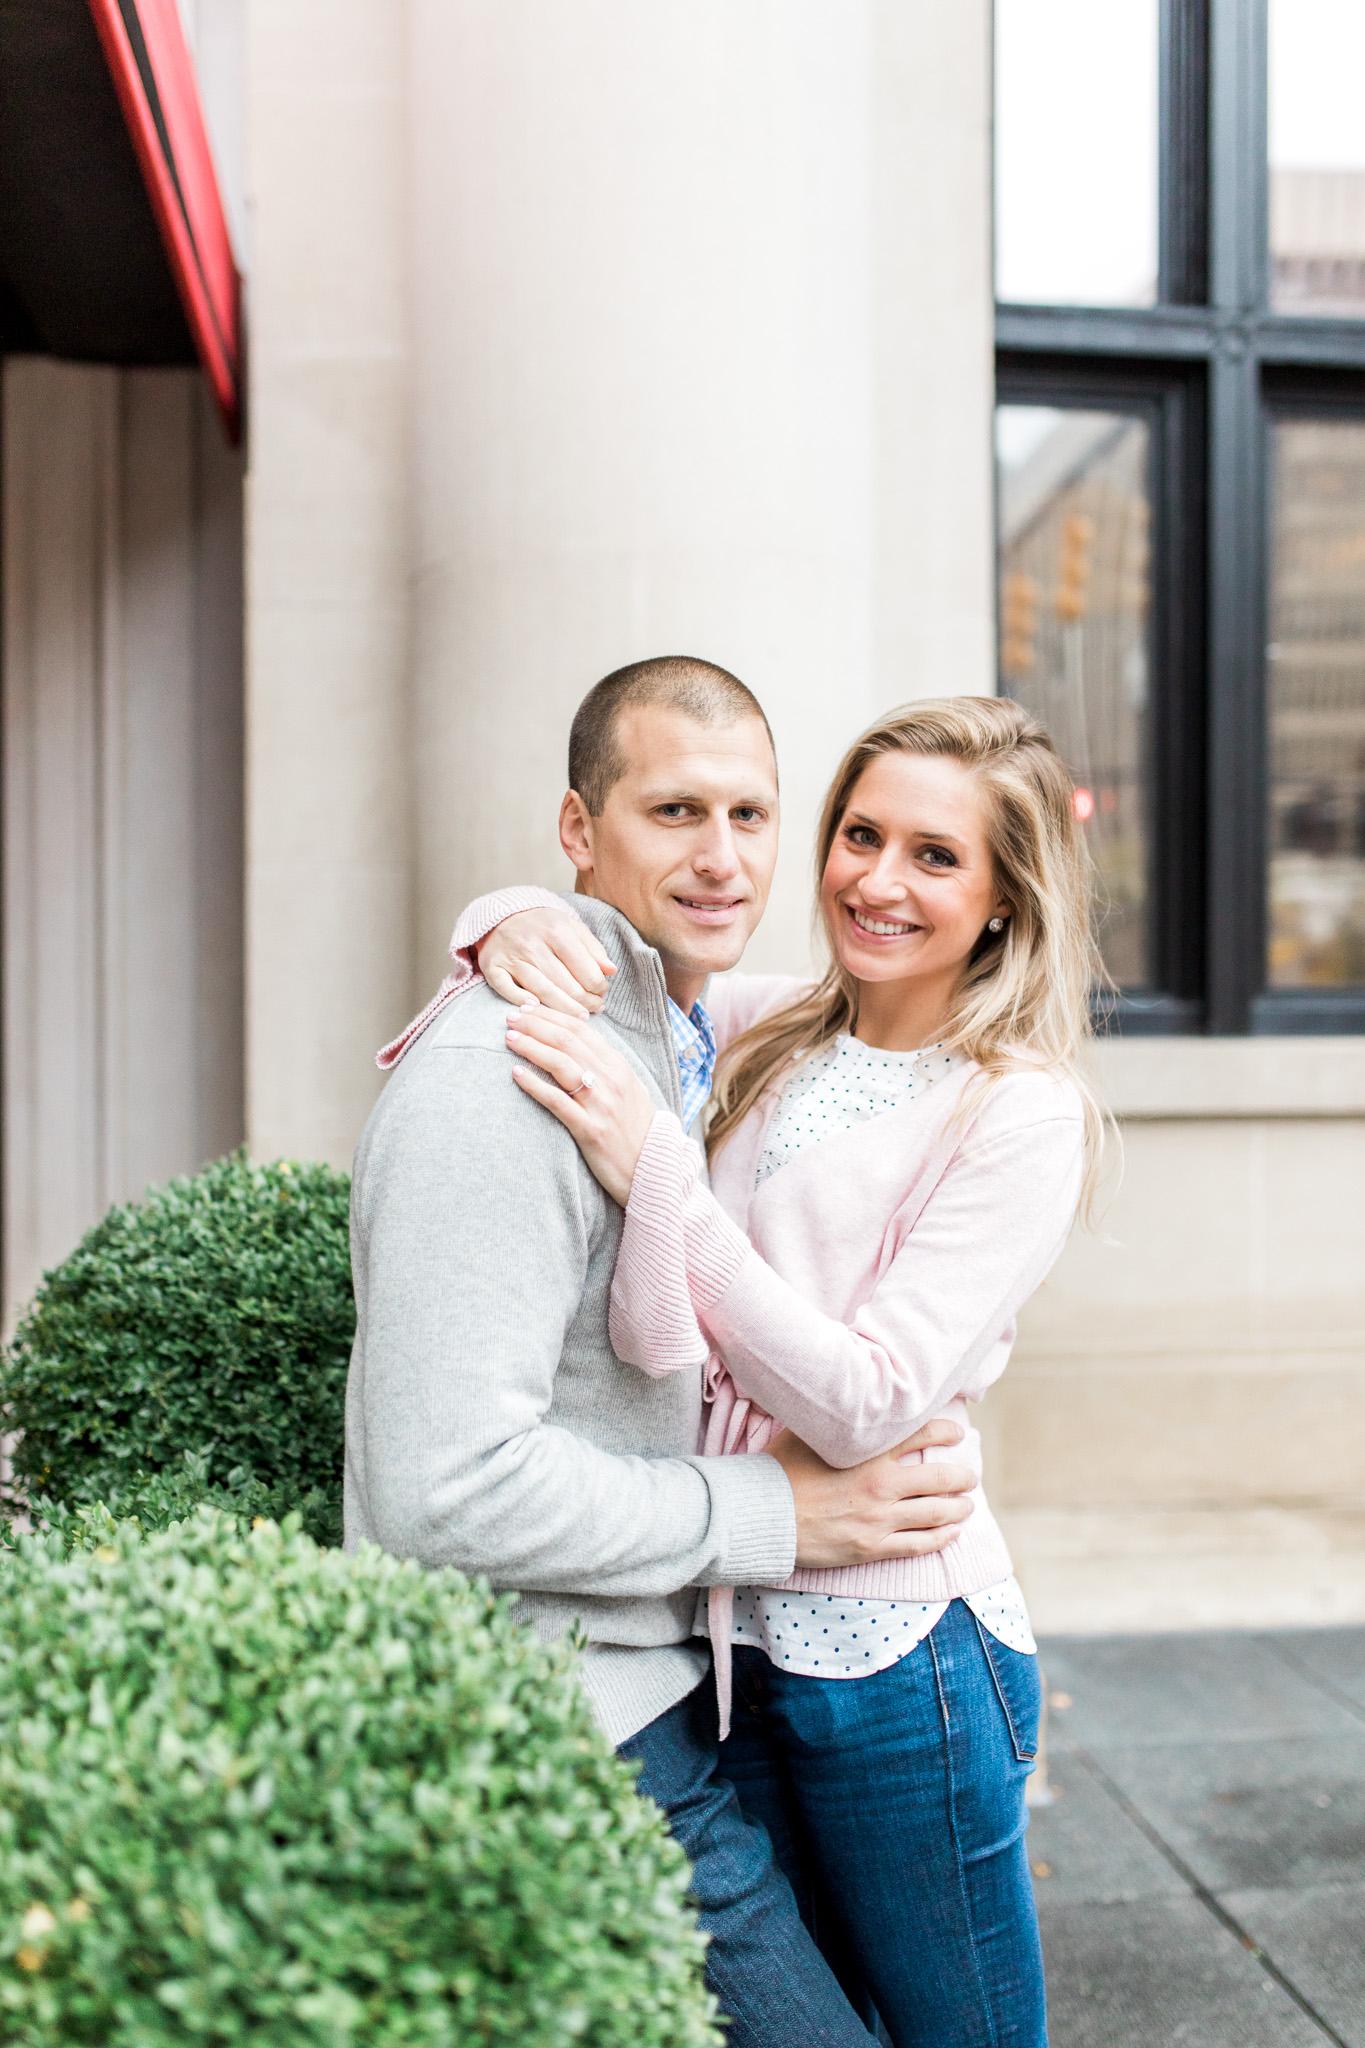 Romantic downtown engagement session | Laurenda Marie Photography | Grand Rapids, Michigan